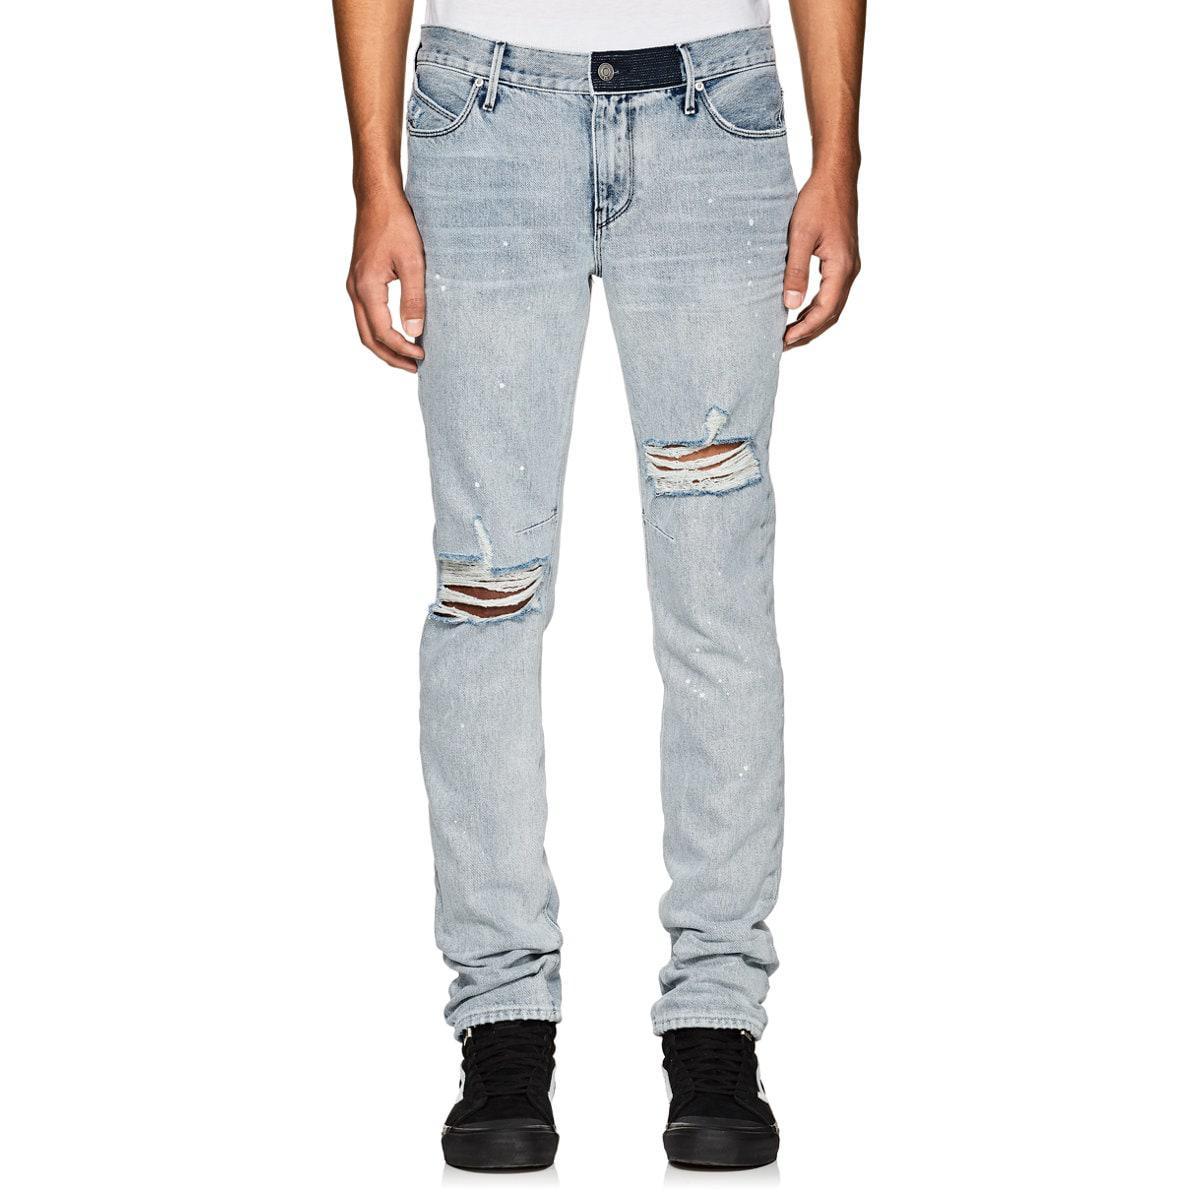 Mens Retraite Anticipée Skinny Jeans Rta L6mRT